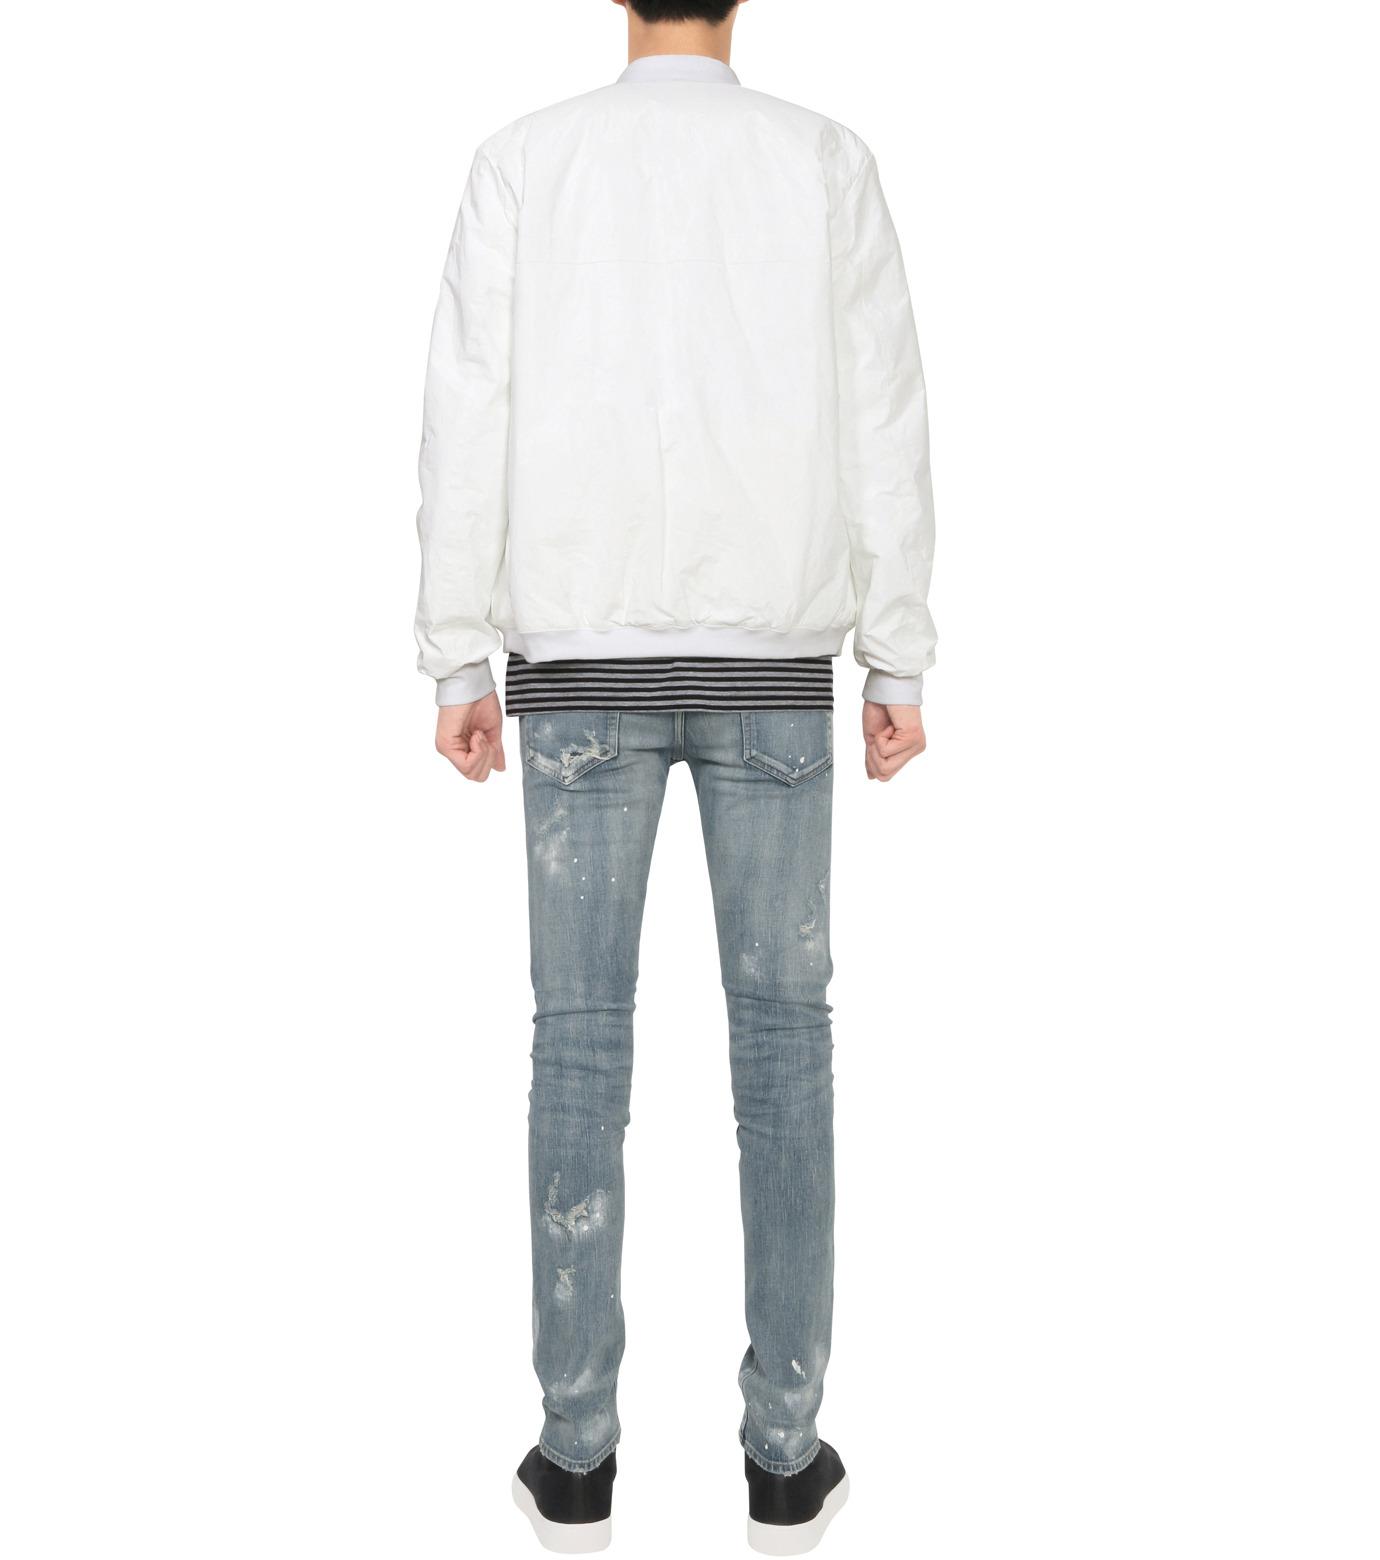 HL HEDDIE LOVU(エイチエル・エディールーヴ)のPAPER RIB COLLAR JACKET-WHITE(ジャケット/jacket)-18A94004-4 拡大詳細画像4